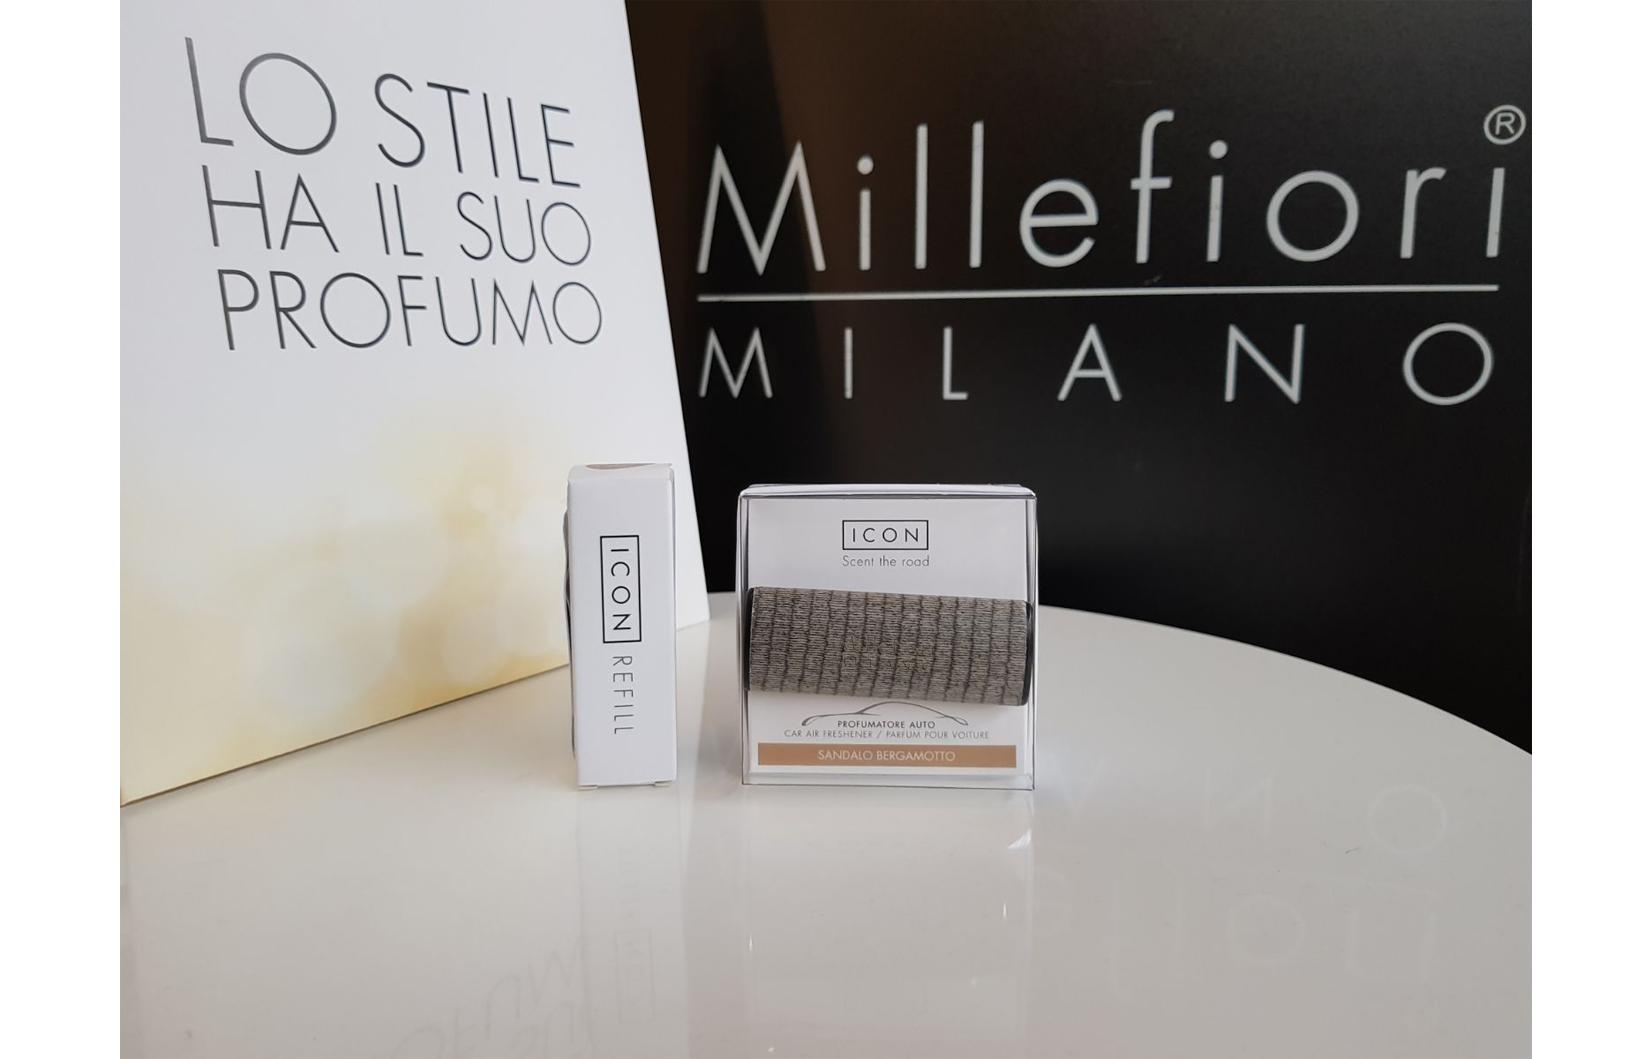 Millefiori CAR BIG Sandalo Bergamotto